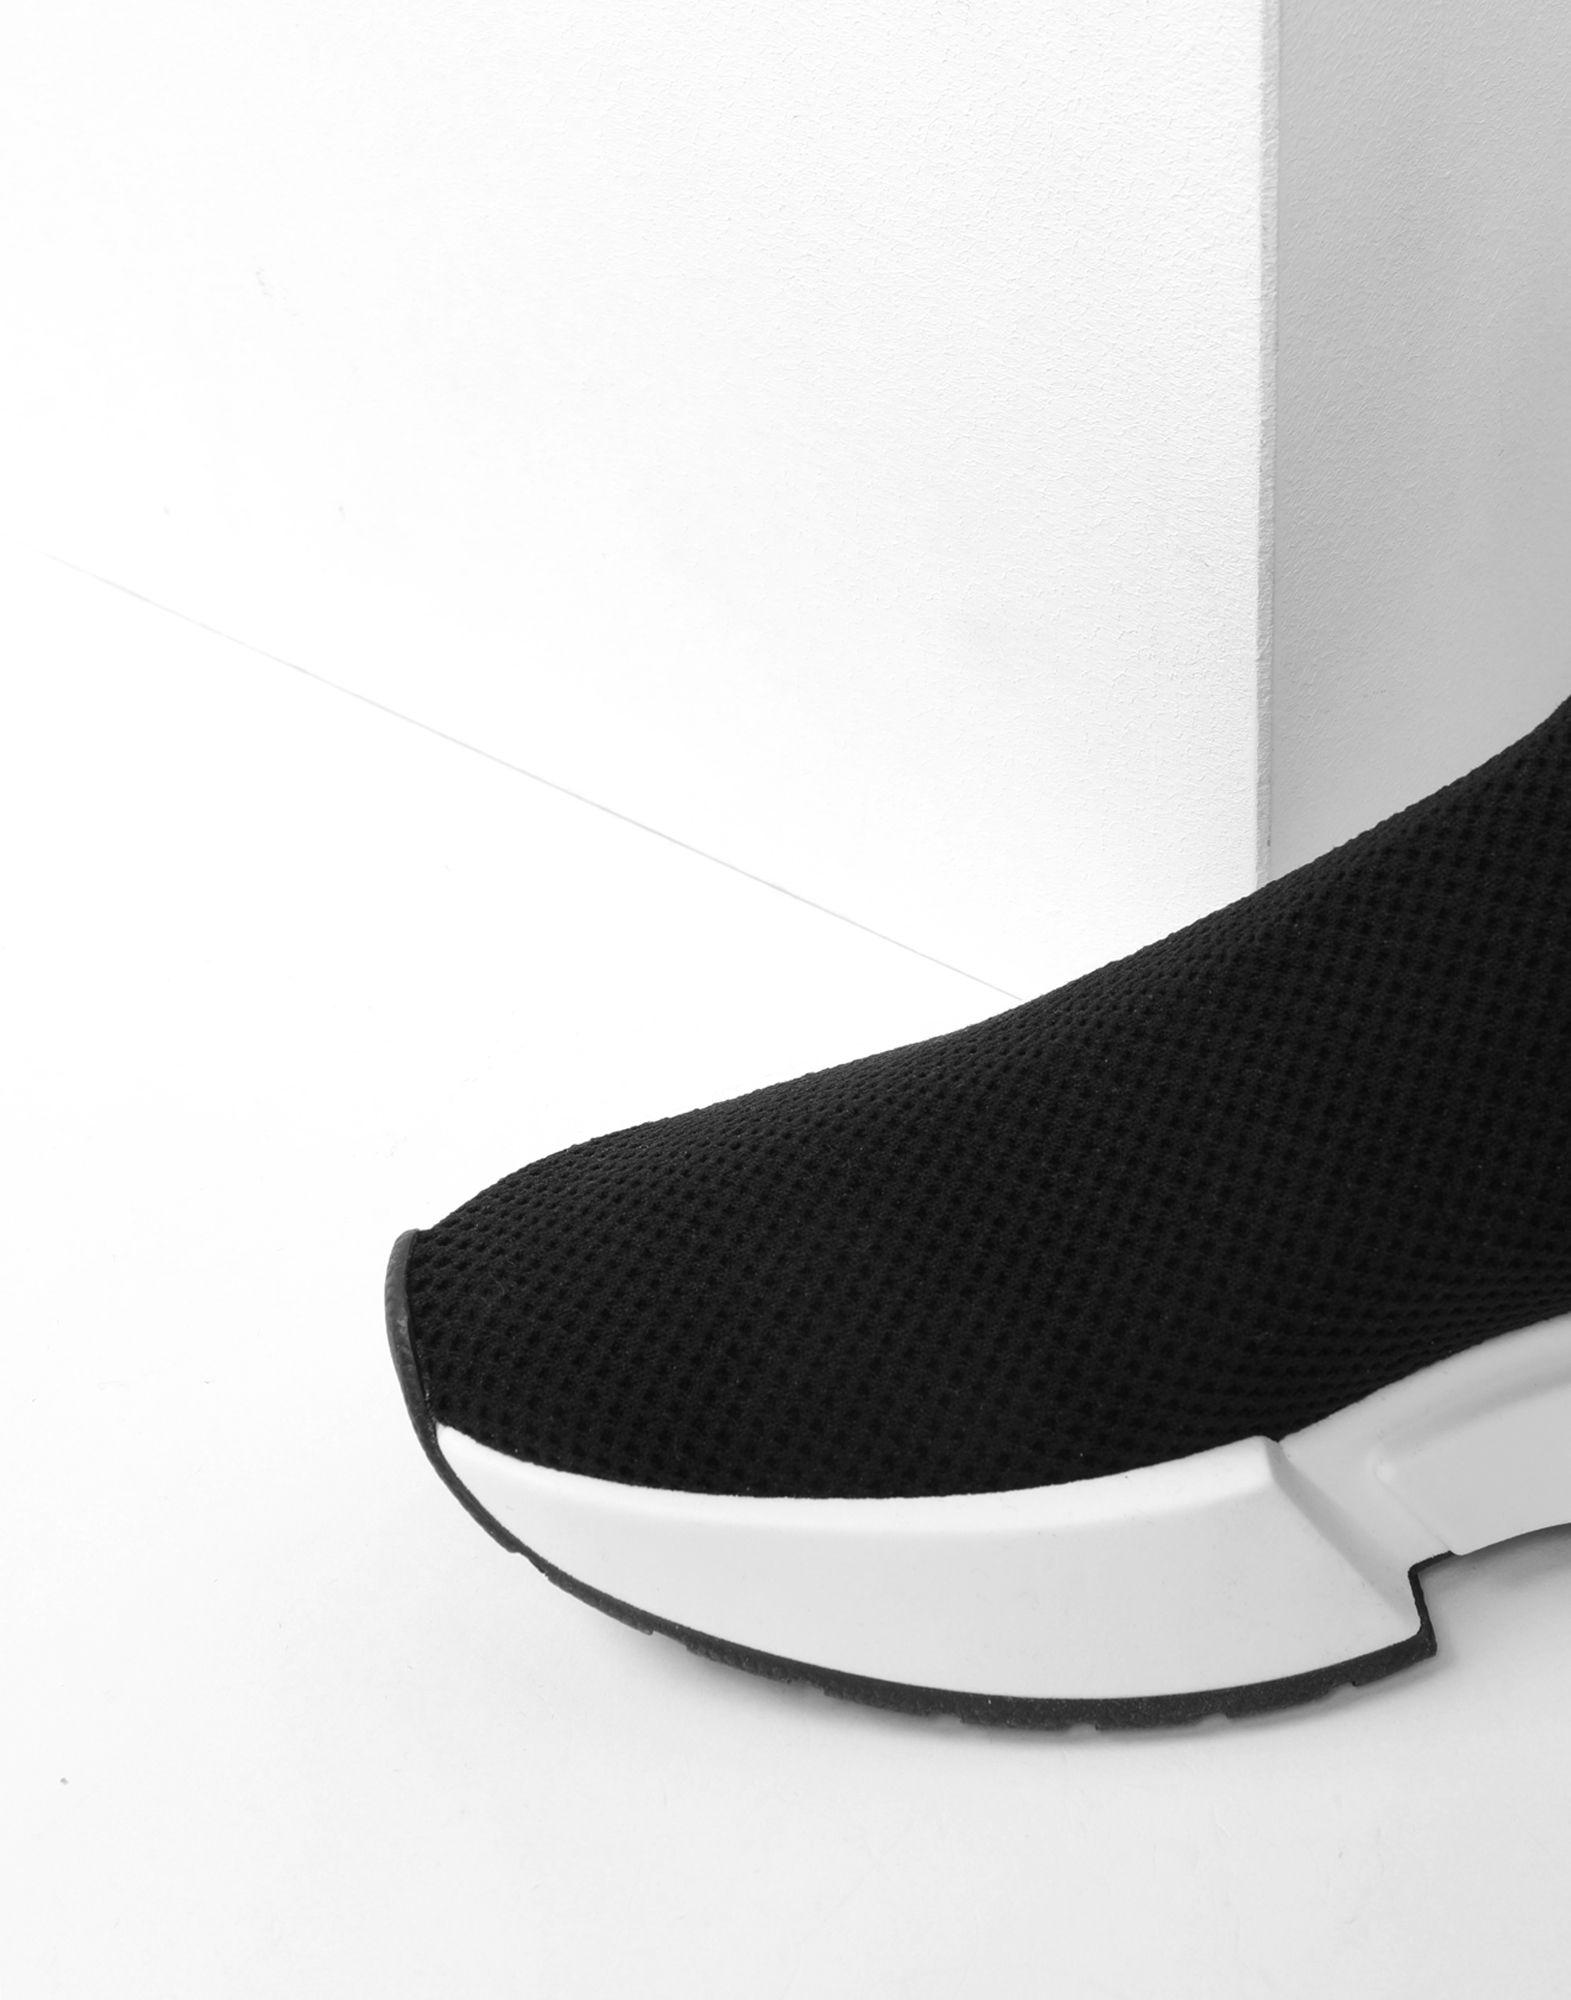 MM6 MAISON MARGIELA Sock runner sneakers Sneakers Woman a